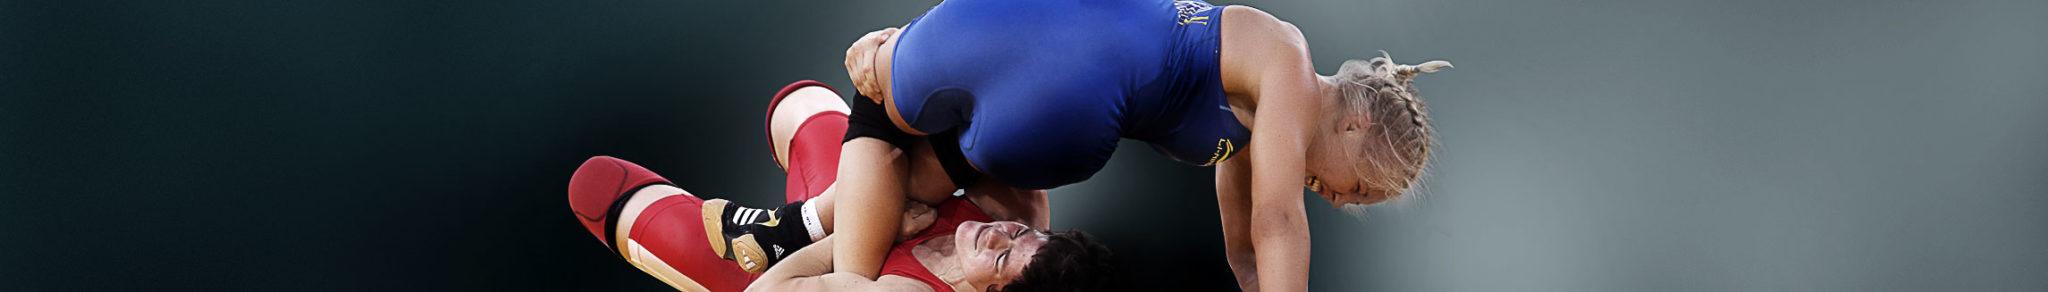 loita feminina